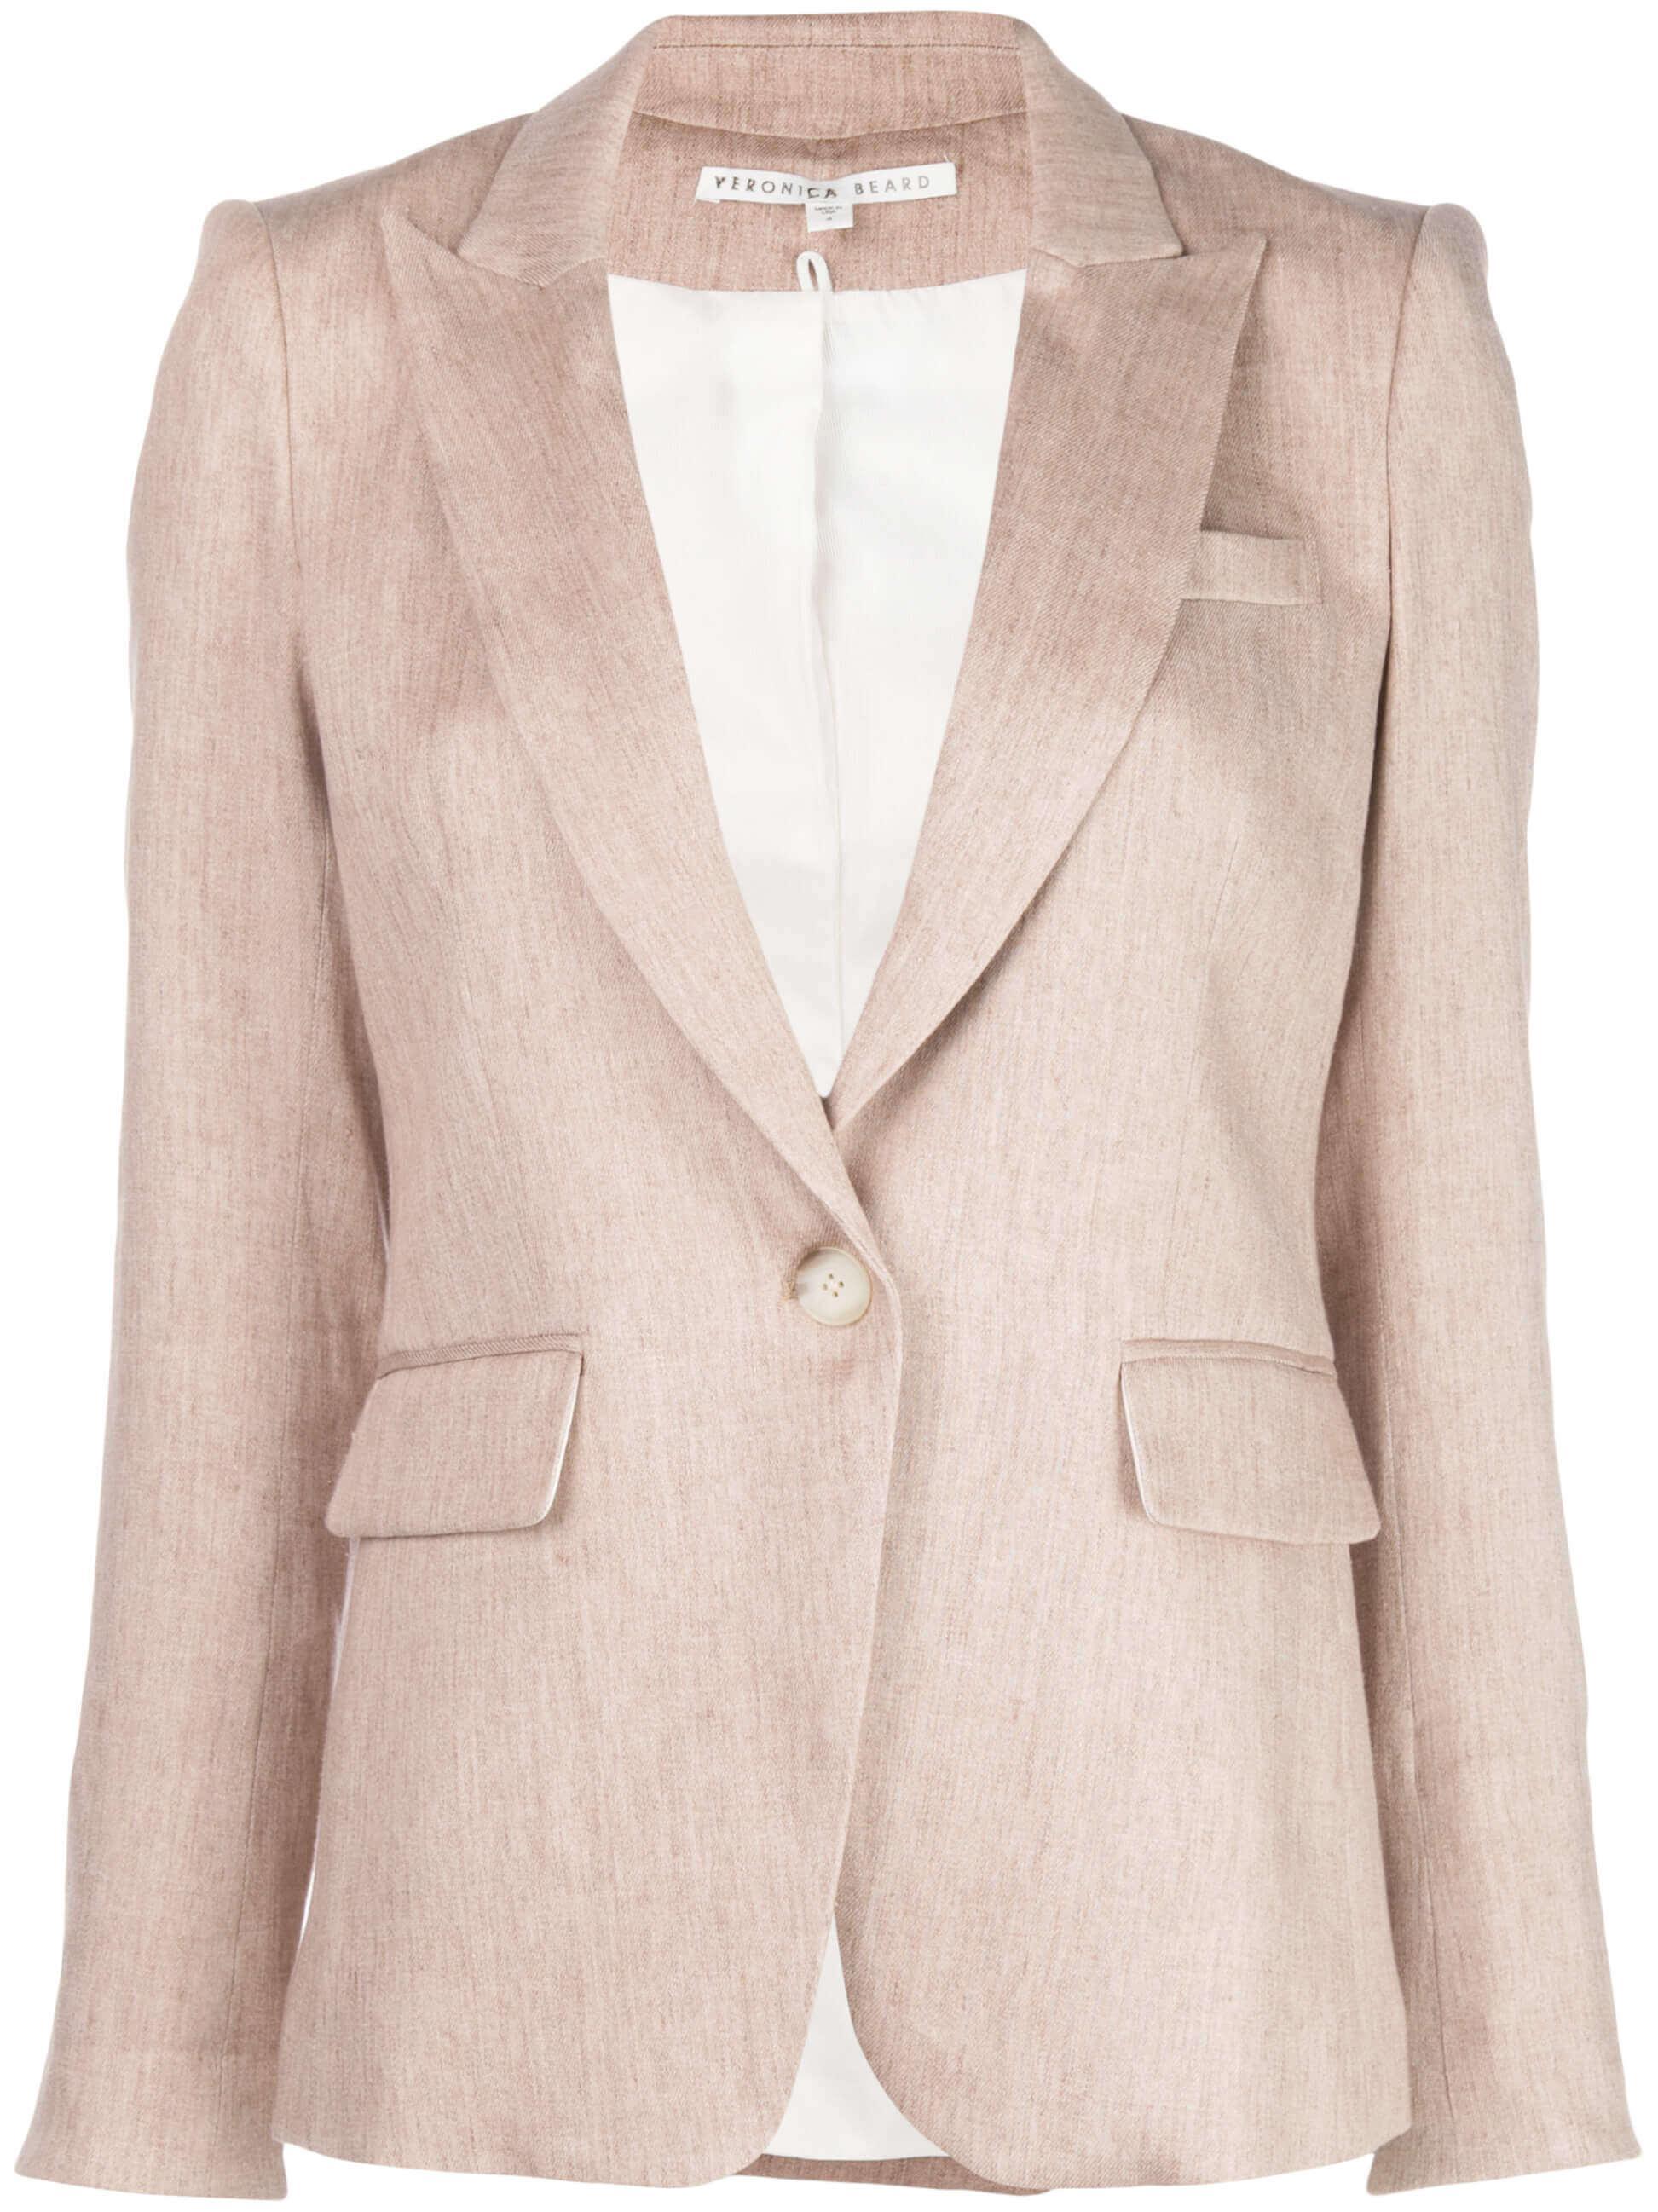 Linen Cutaway Jacket Item # CORELN0081290